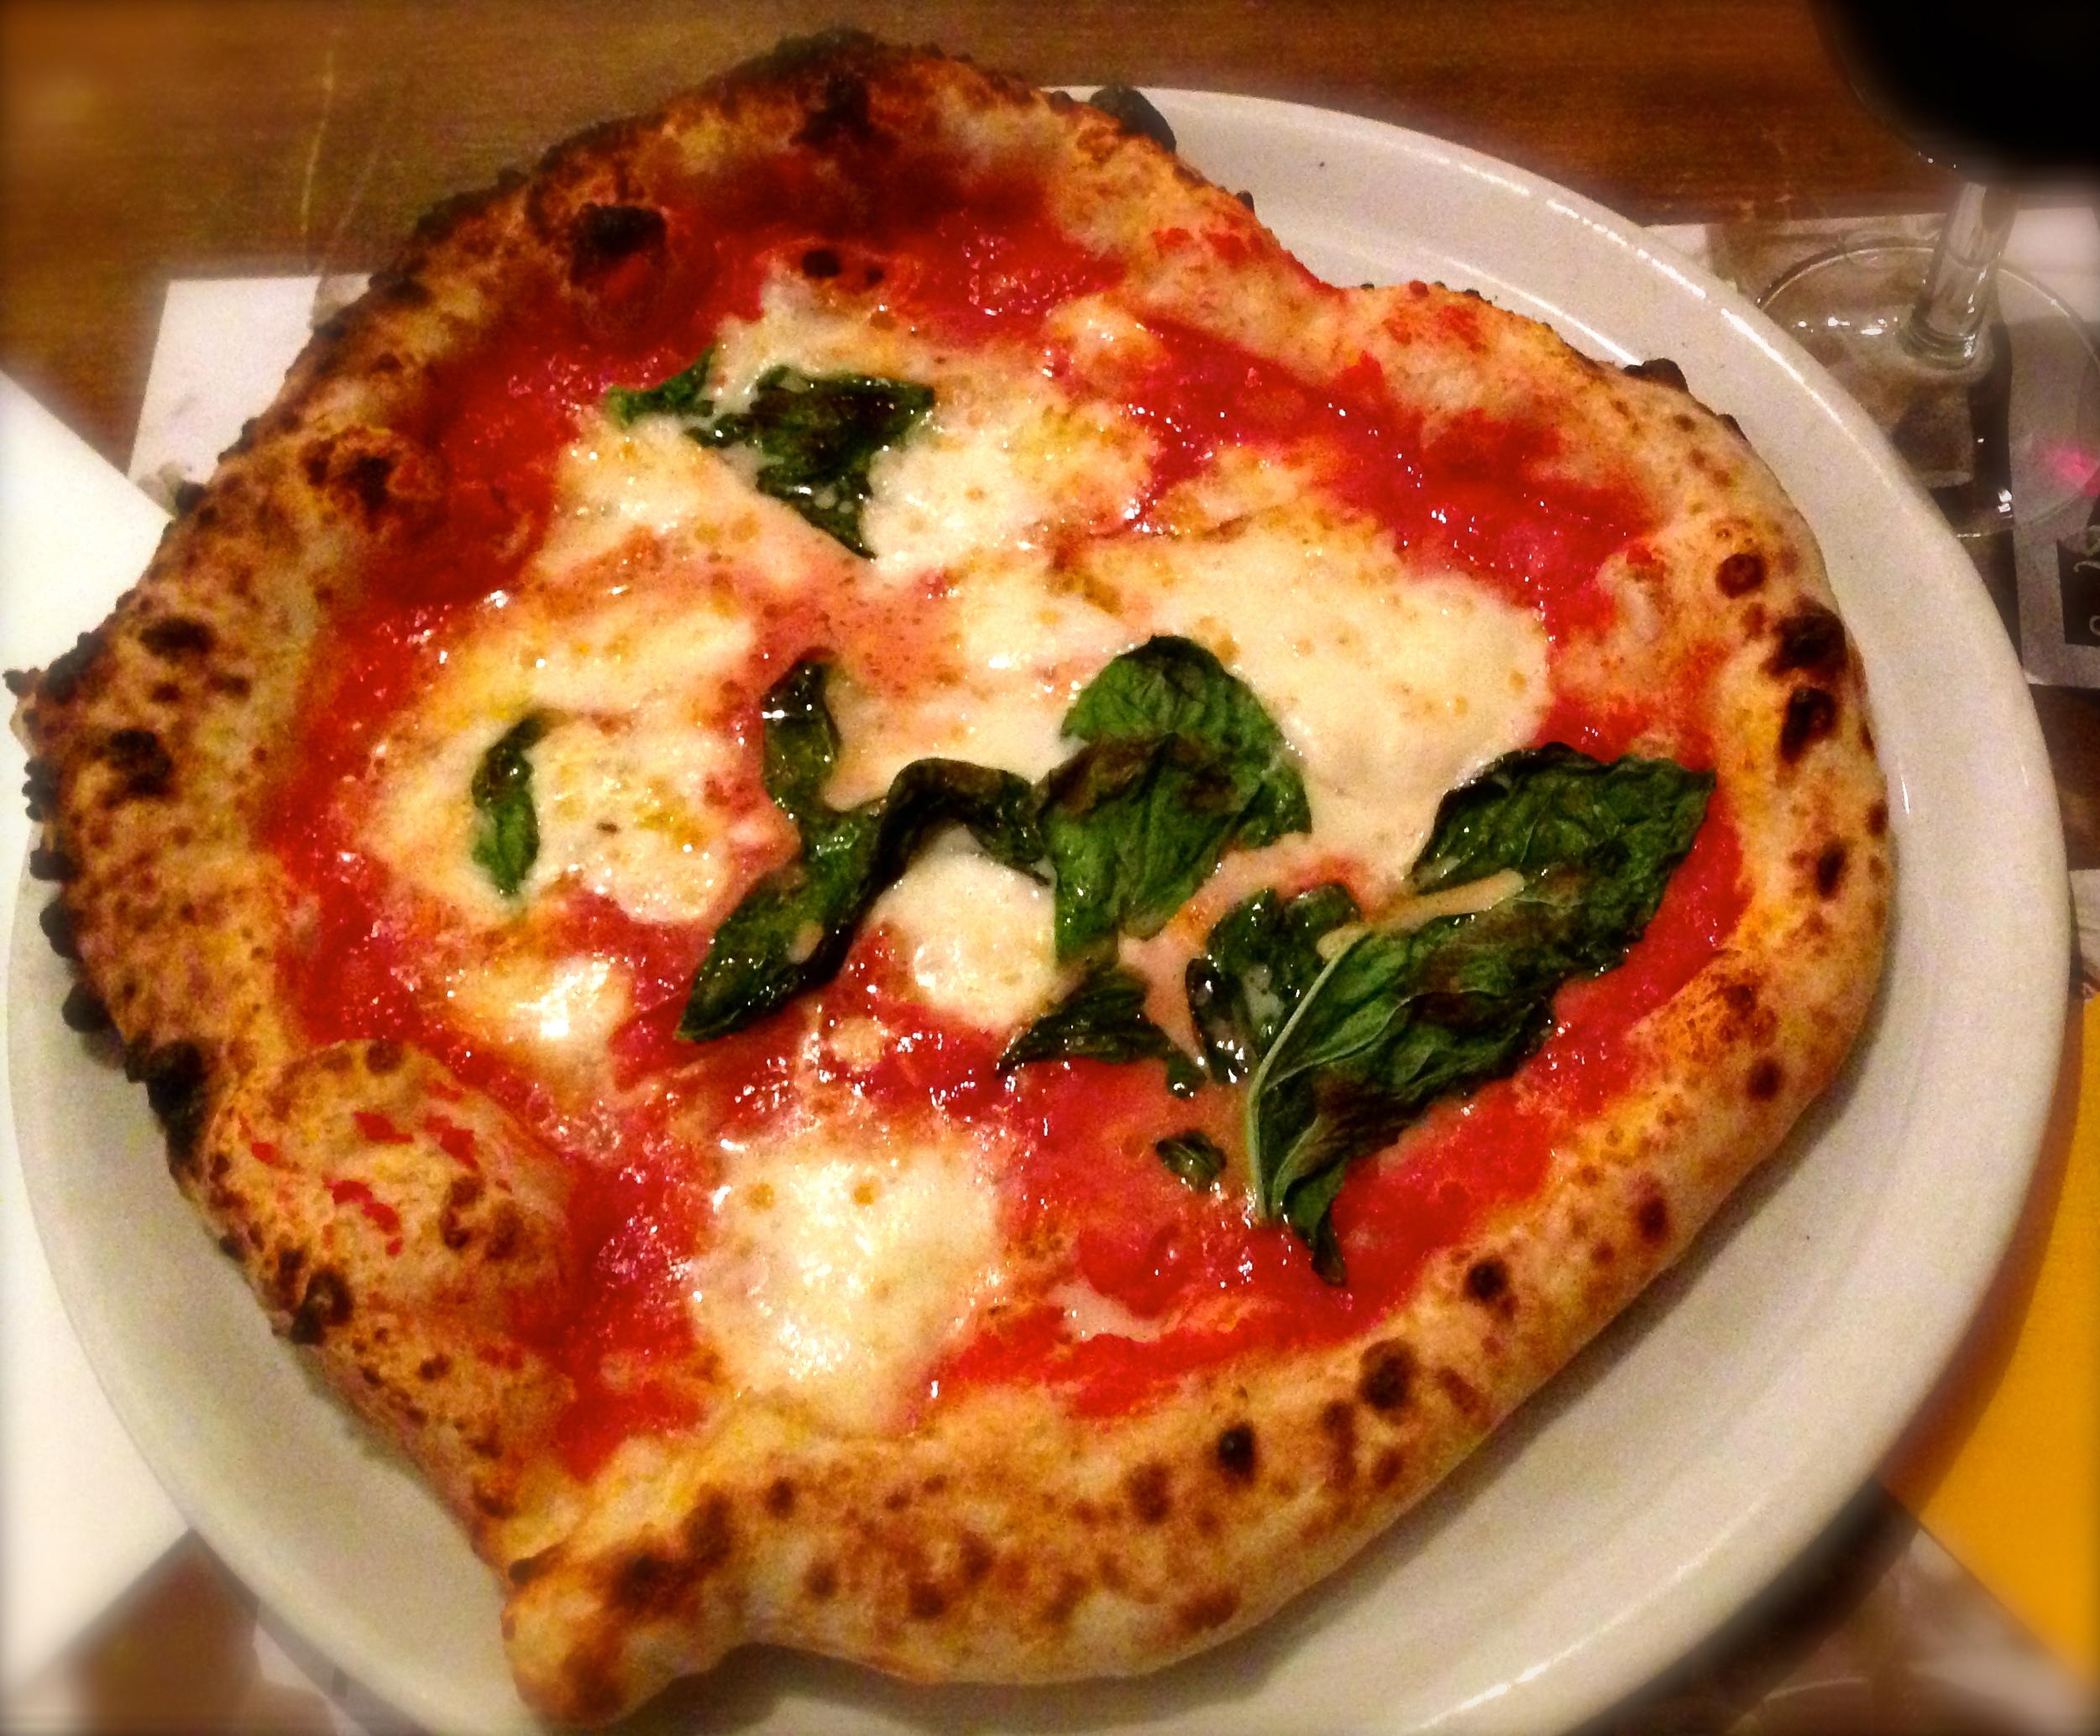 florence italian cuisine irvine - photo#22